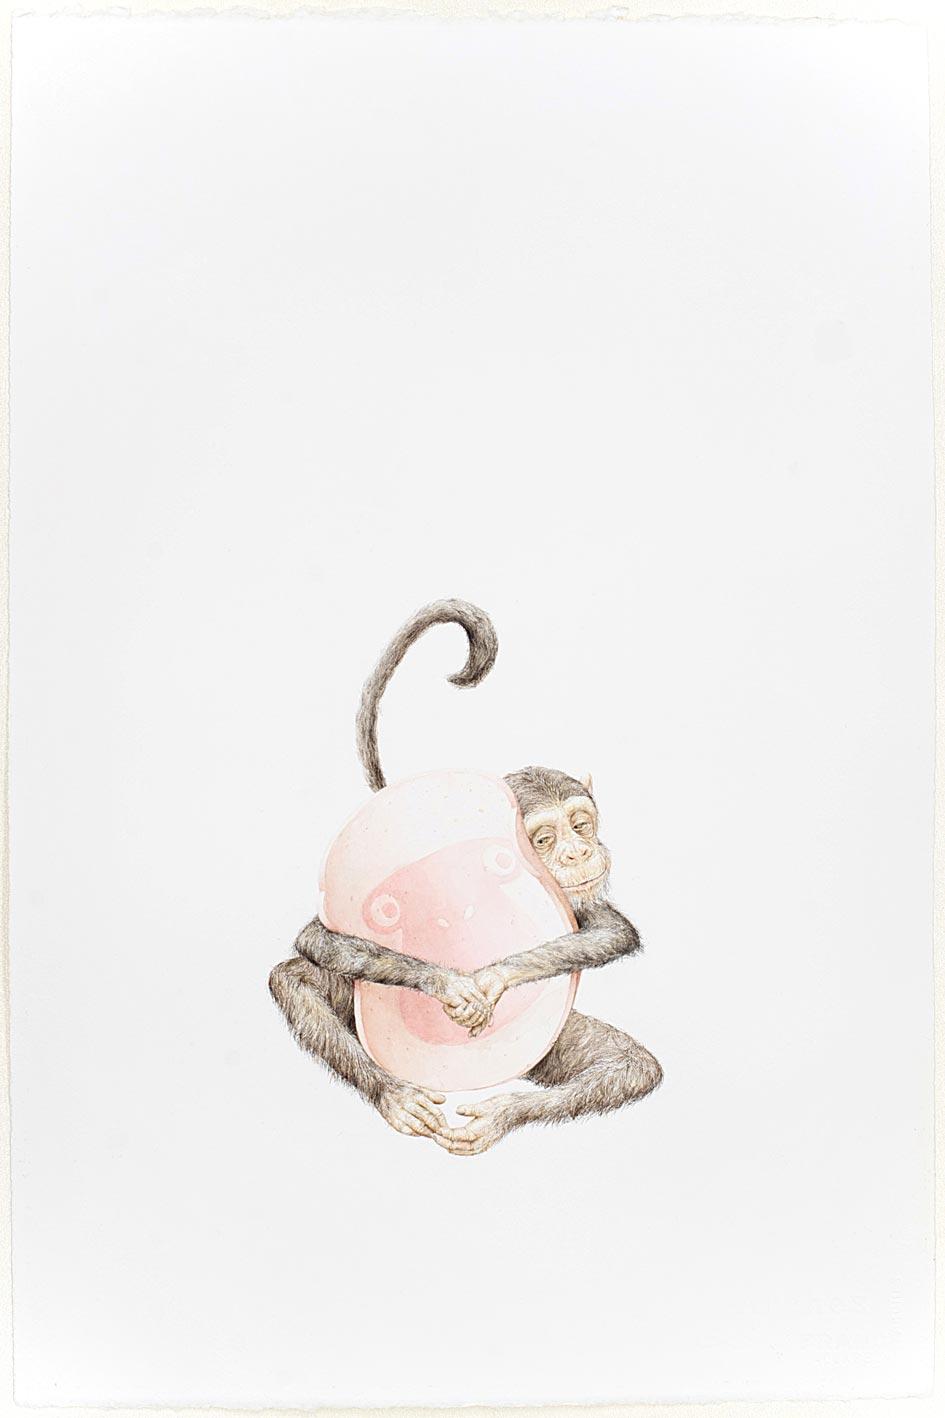 © LARS HINRICHS, UNTITLED (MONKEY), 2011, AQUARELLE, 56 X 38 CM